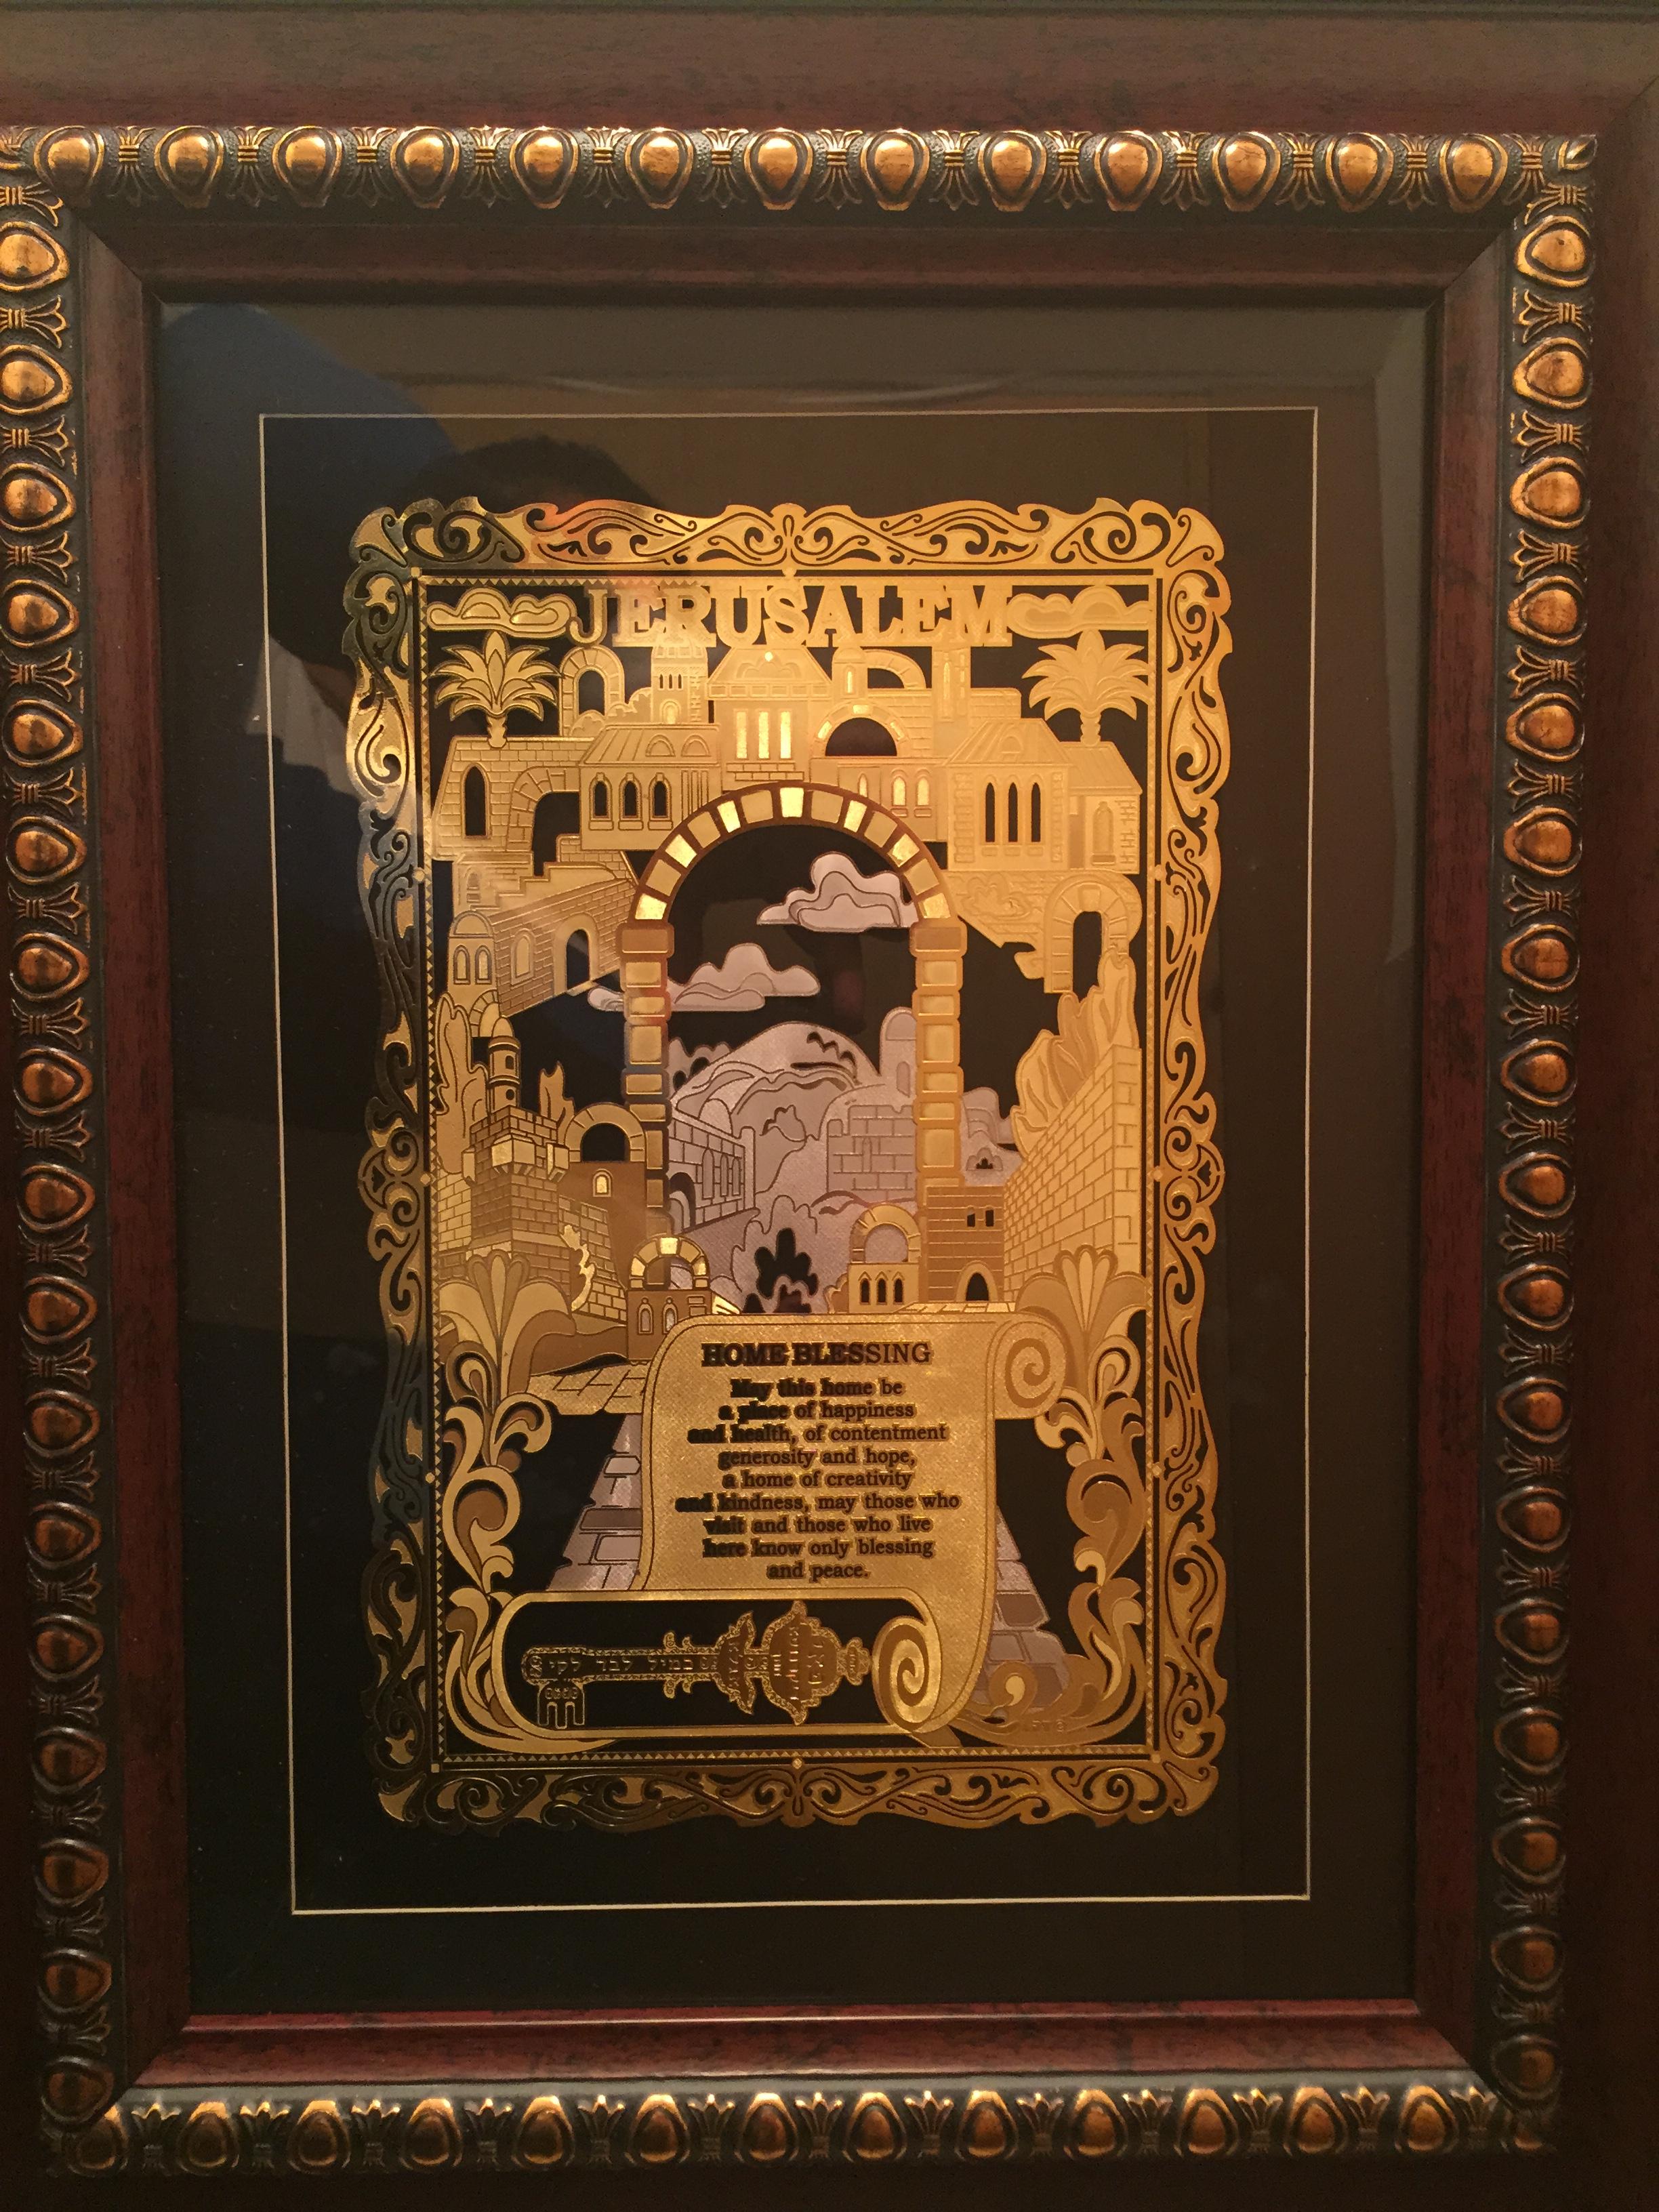 Jerusalem Blessing Home - Gold Plated